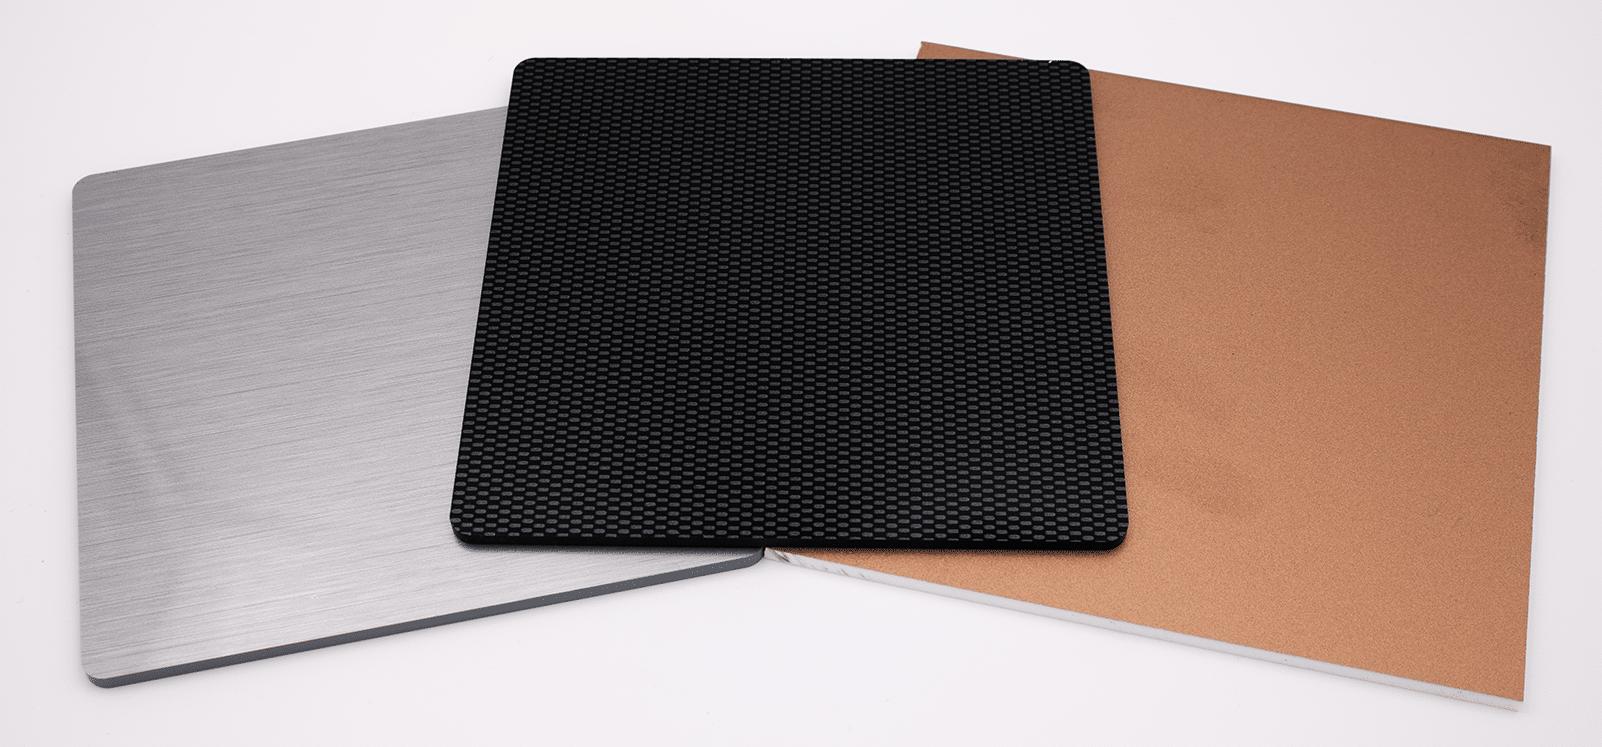 Materials science of plastic housings: Polystrol brushed aluminum material, carbon look, EMC paint